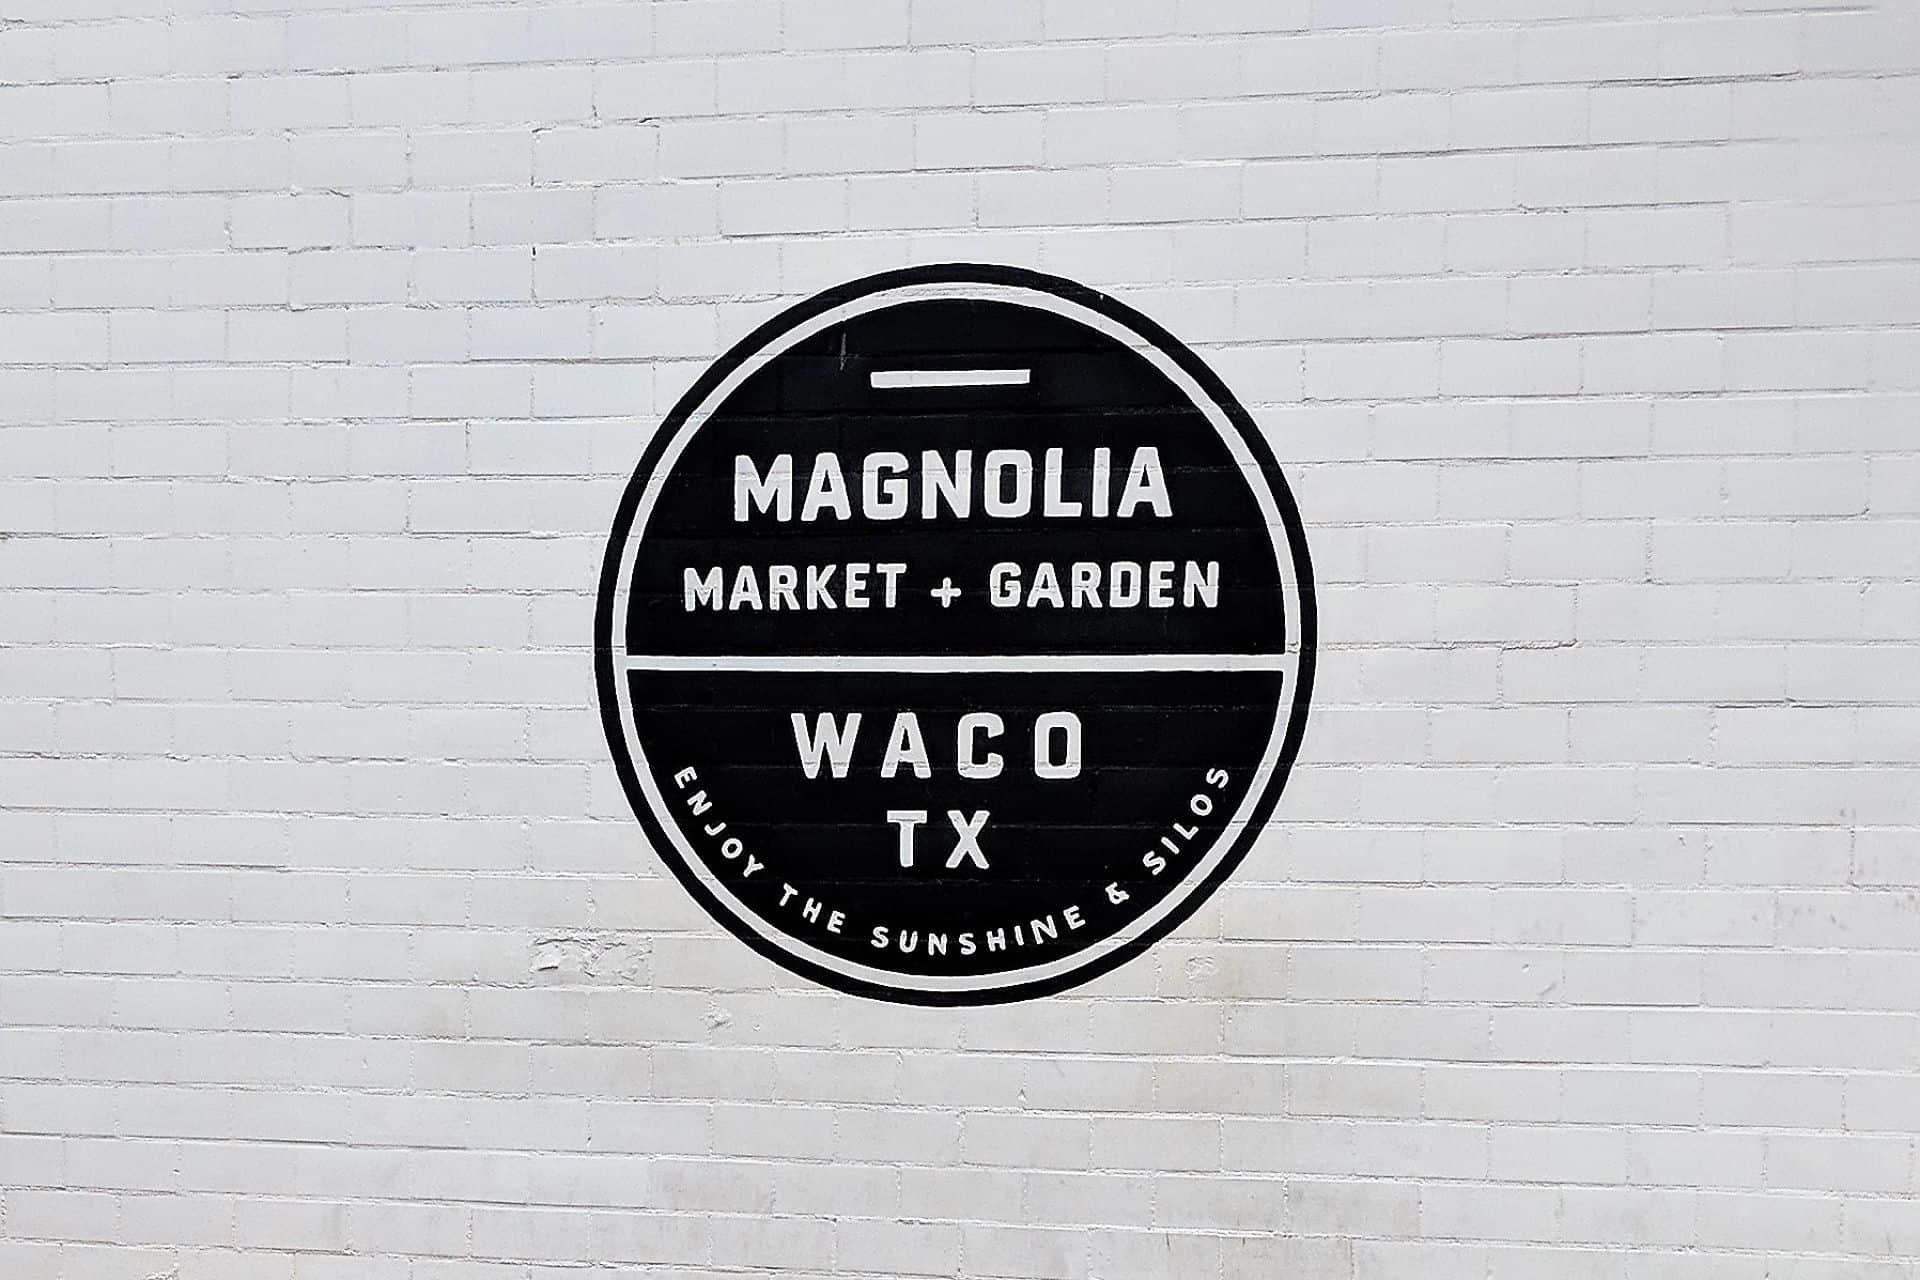 Music Studio Branding Lessons from Magnolia Market